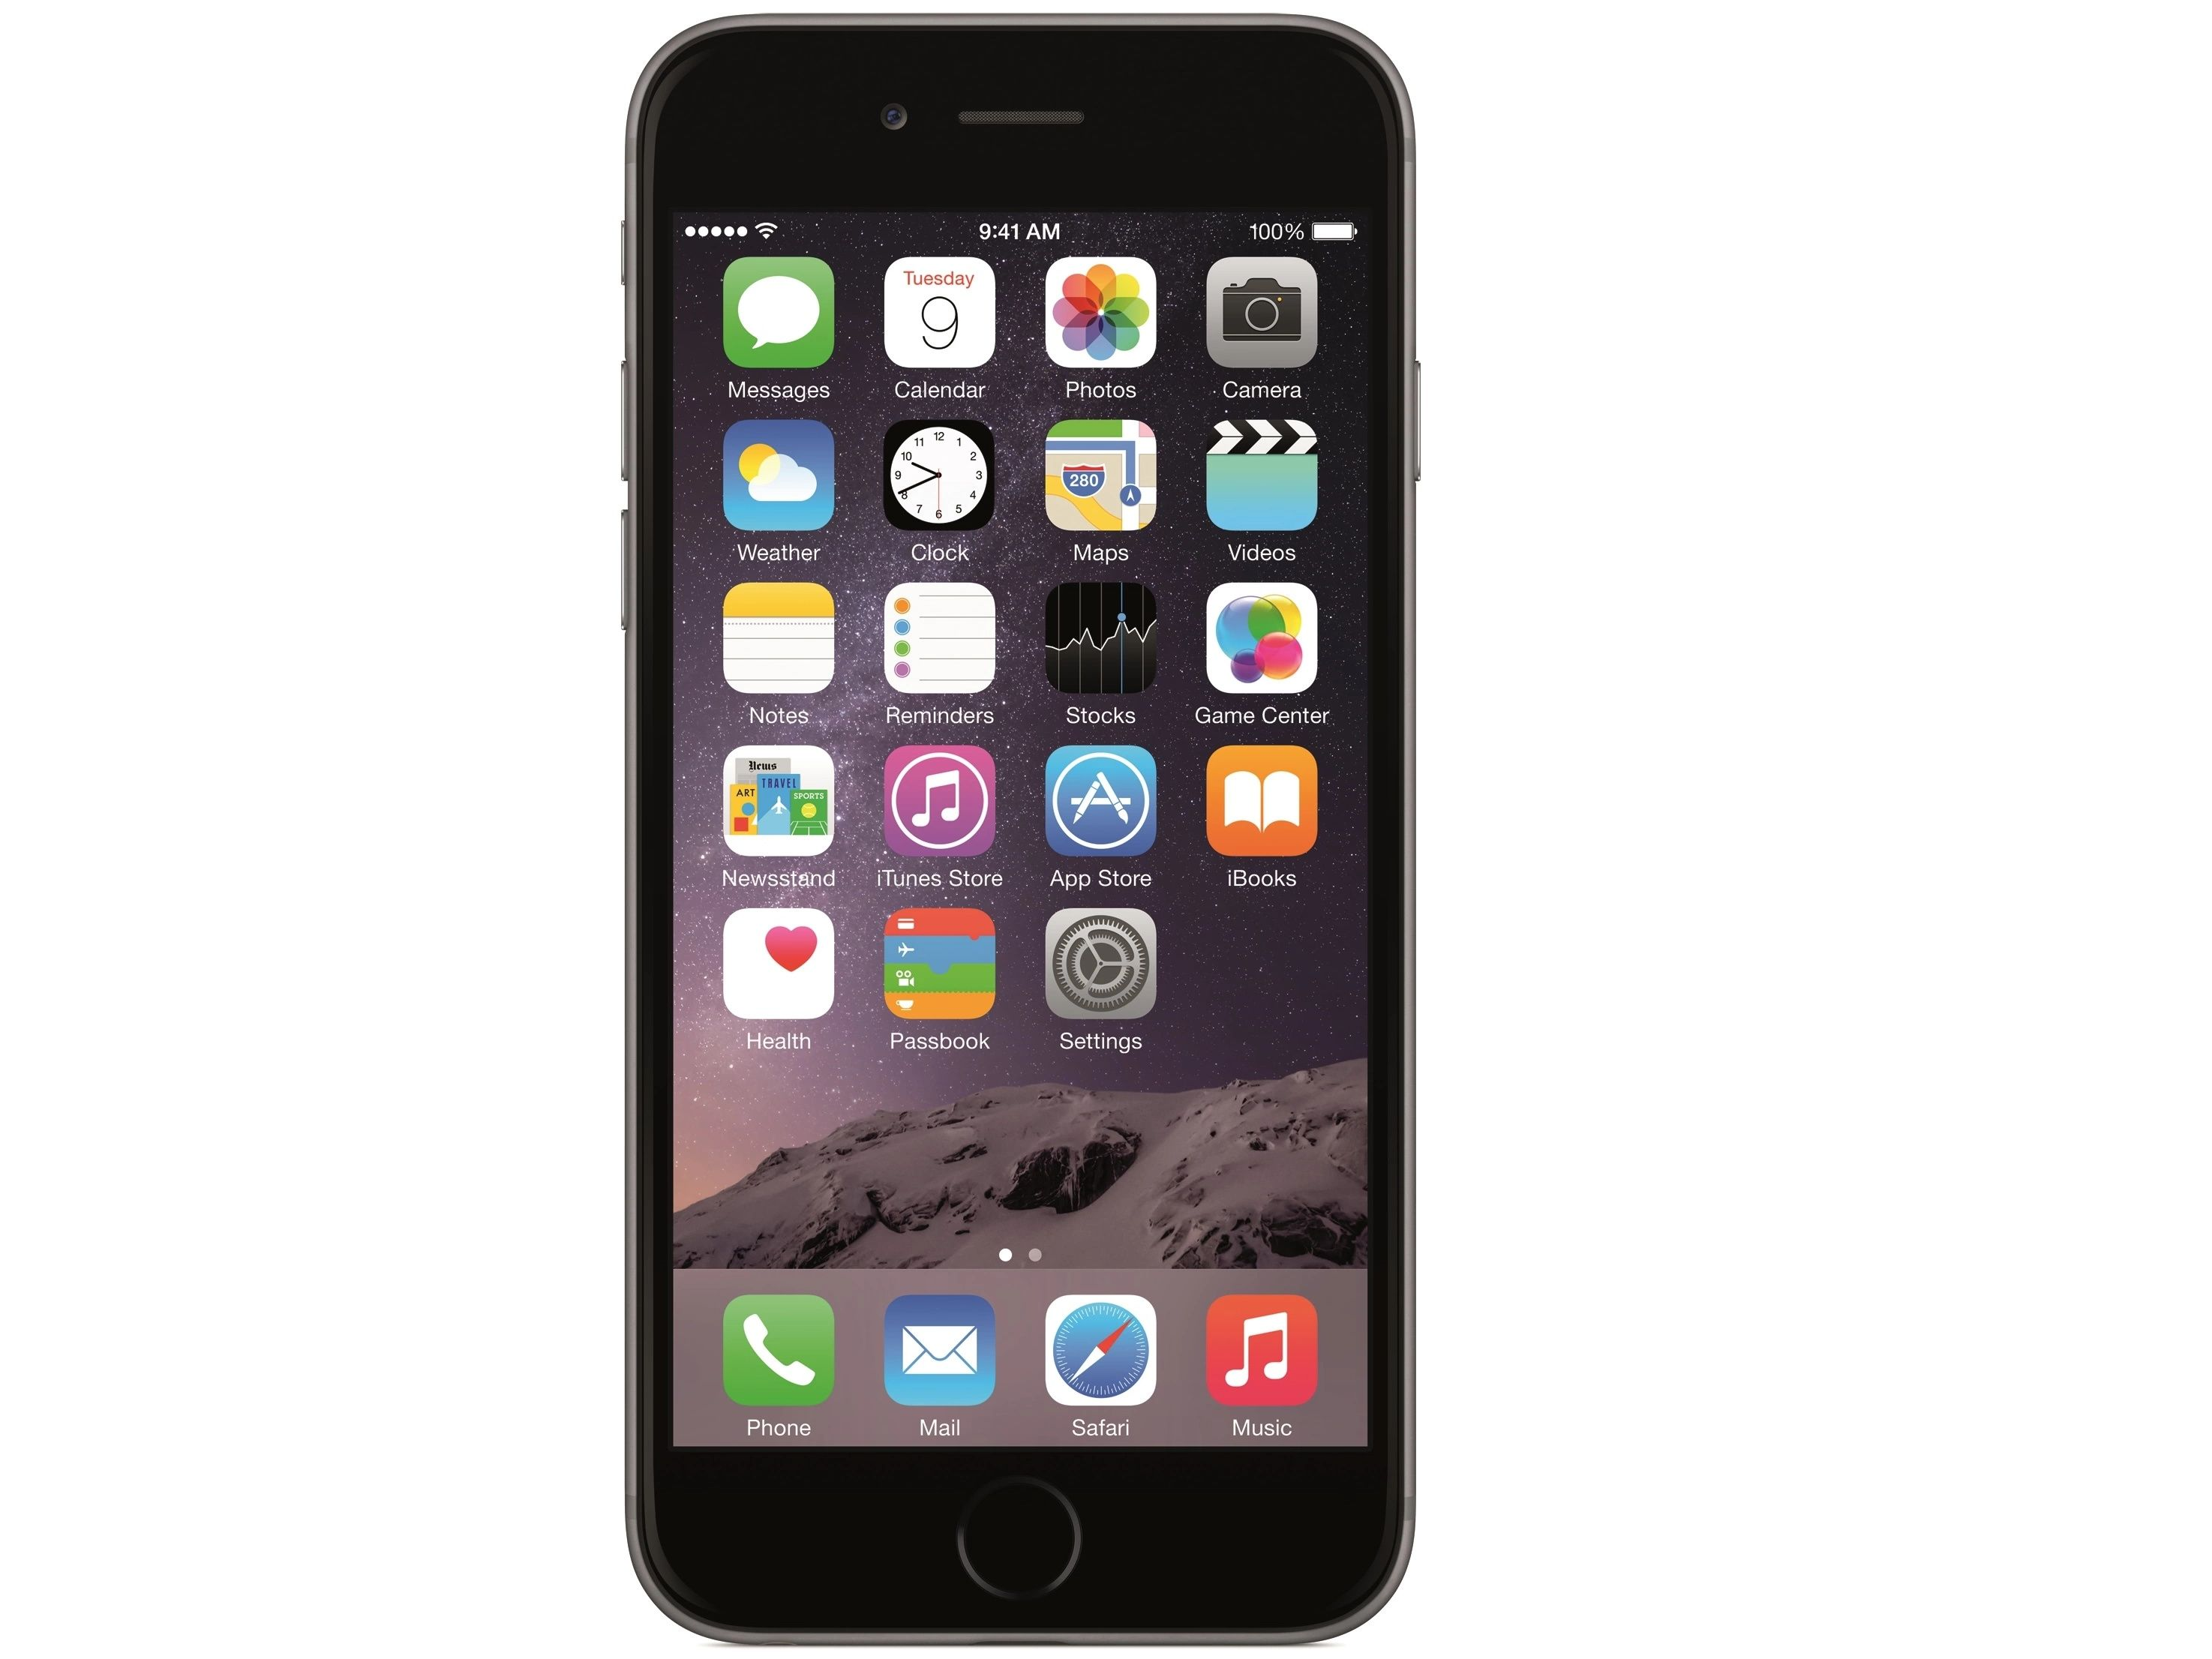 iphone 6 and iphone 6 plus smartphones Apple Iphone